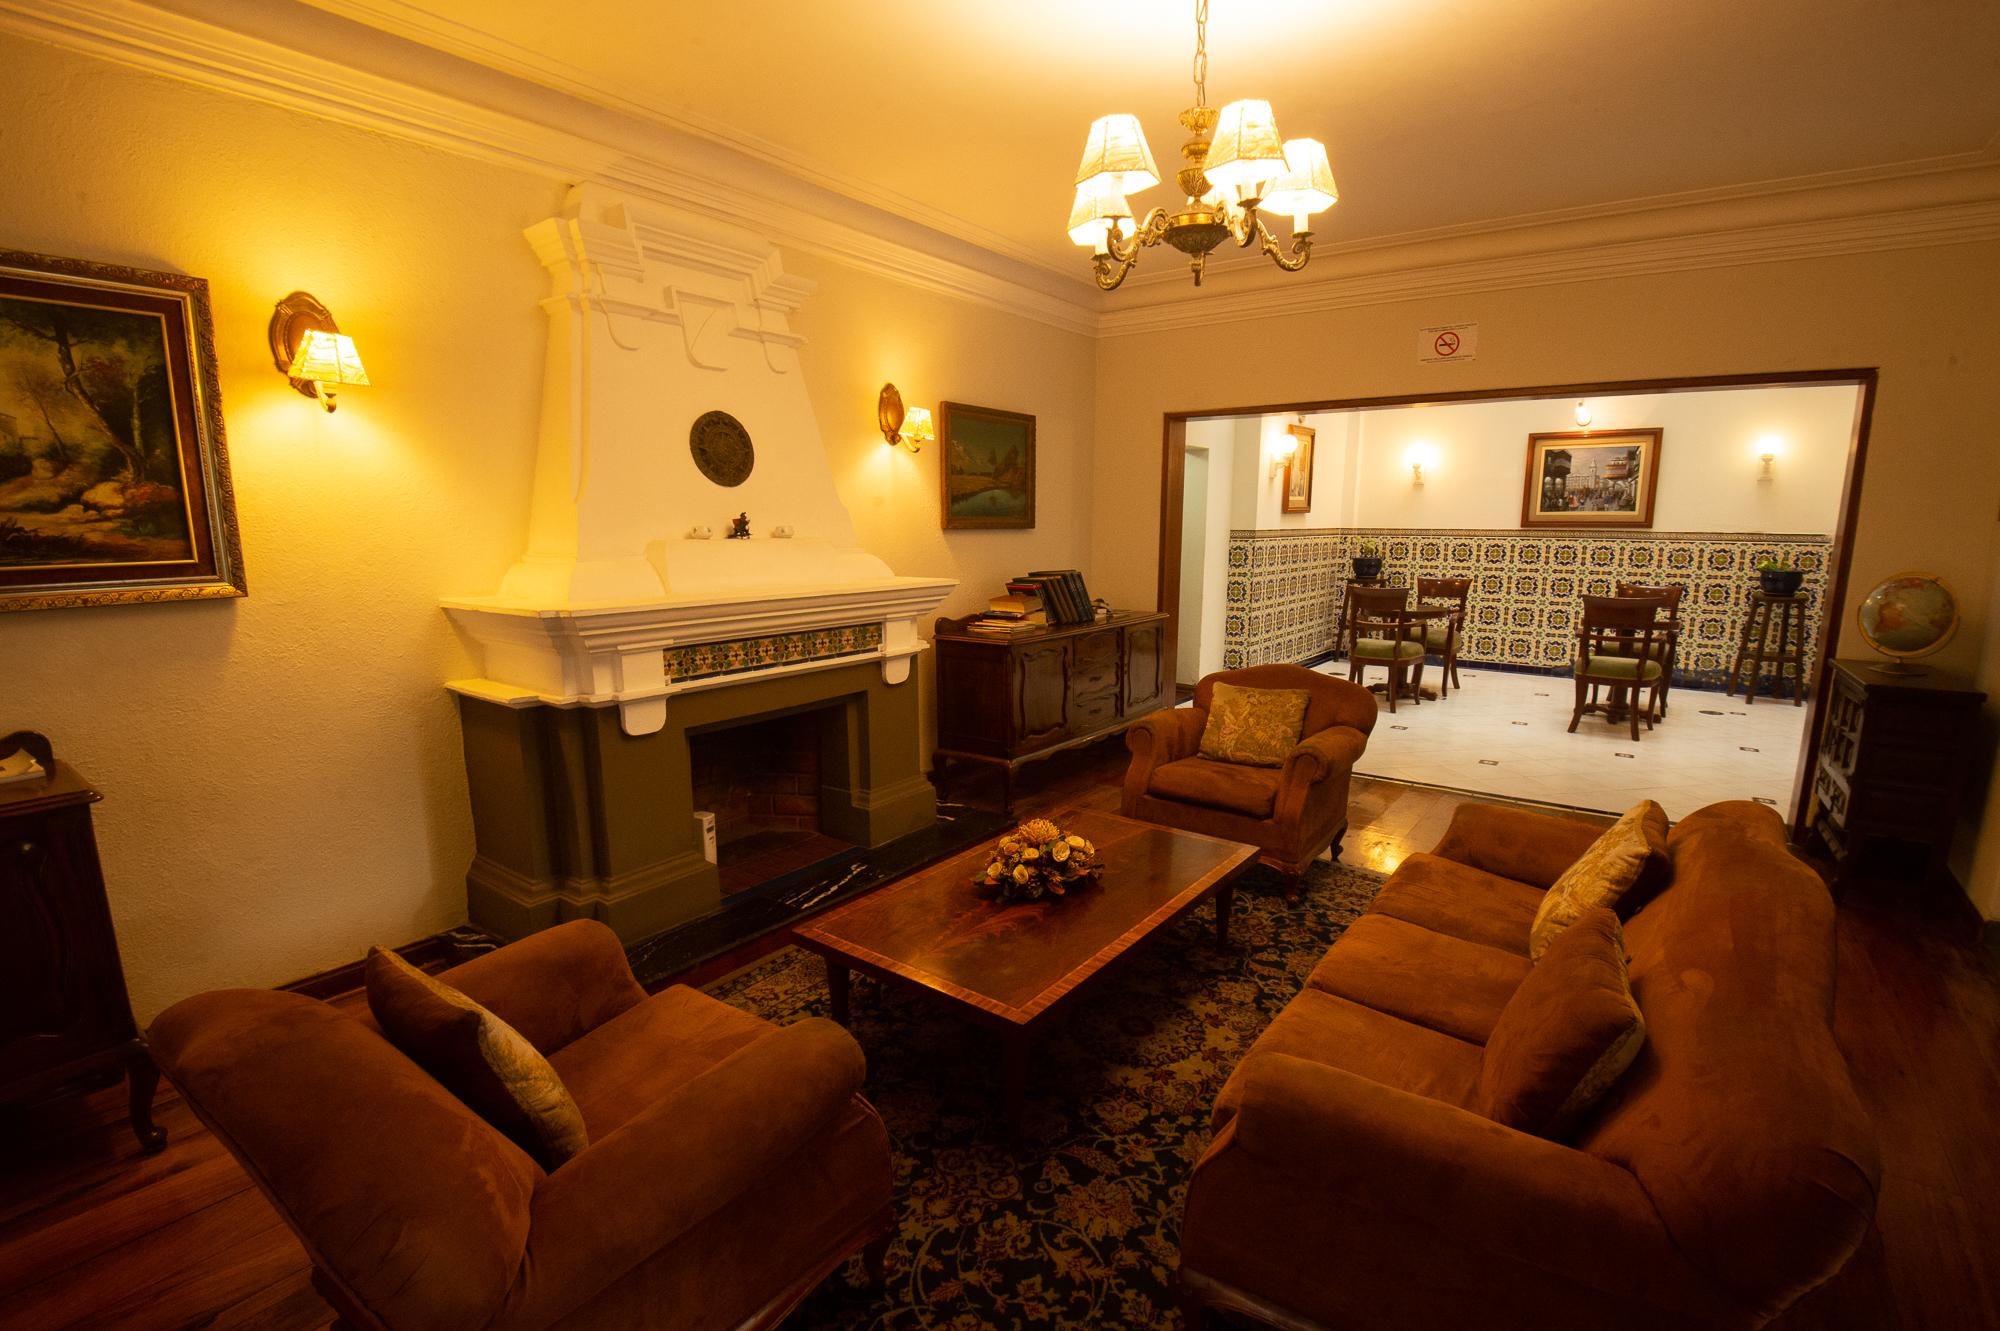 Hotel San Antonio Abad - Internal Lounge III